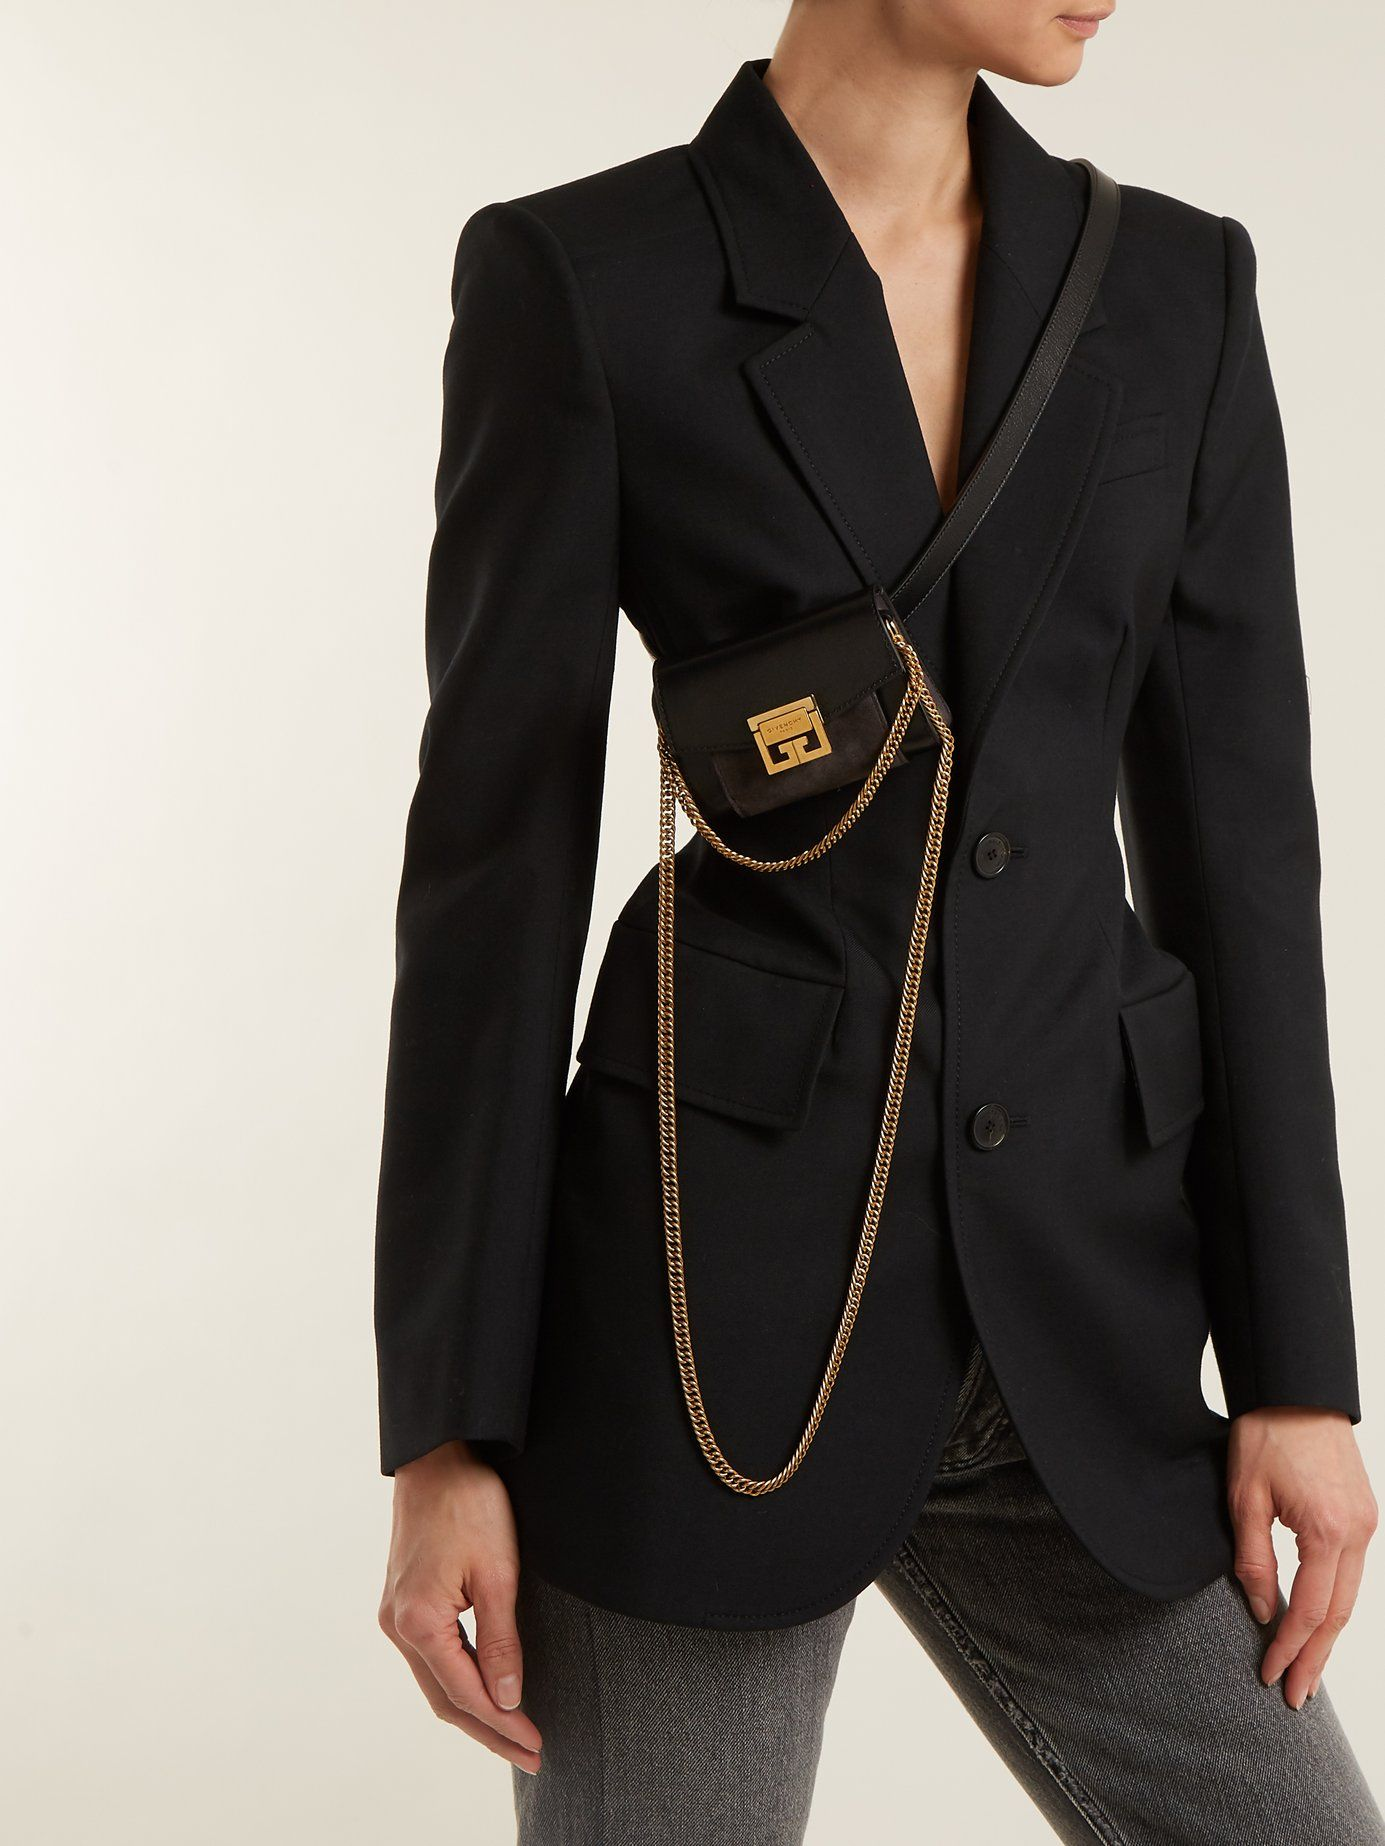 3ff1c8911d GV3 nano suede and leather belt bag | Givenchy | MATCHESFASHION.COM ...